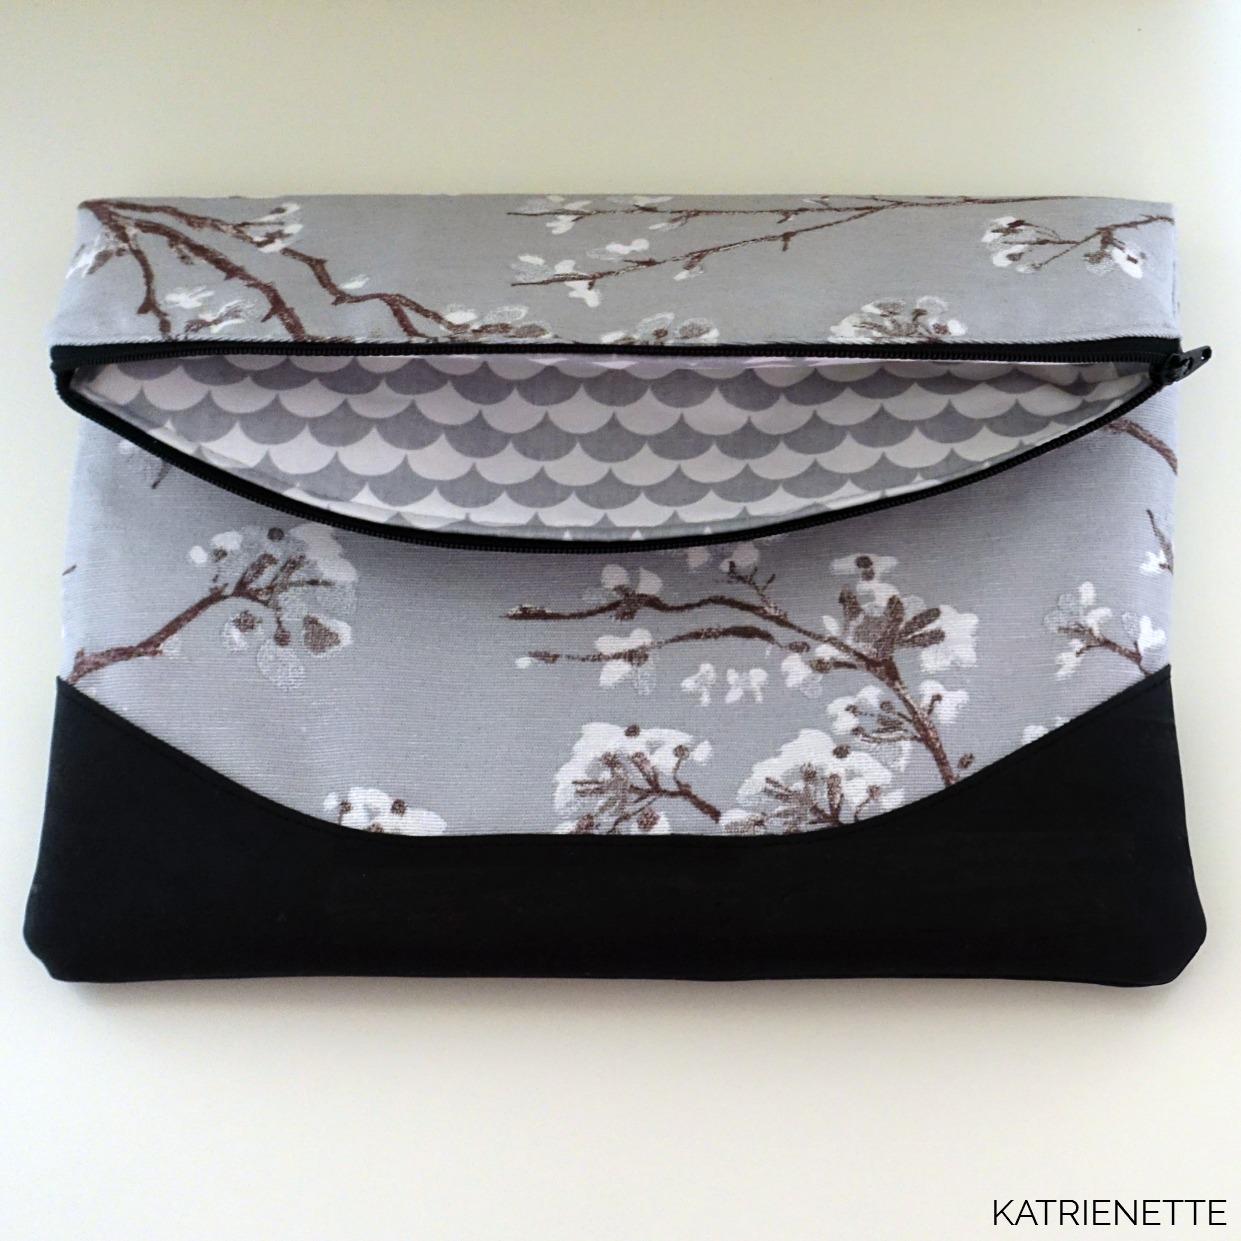 katrienette swoon heidi foldover clutch wristlet bag bags tas tasje kurk kurkleer flower flowers fabric bloem bloemen stof